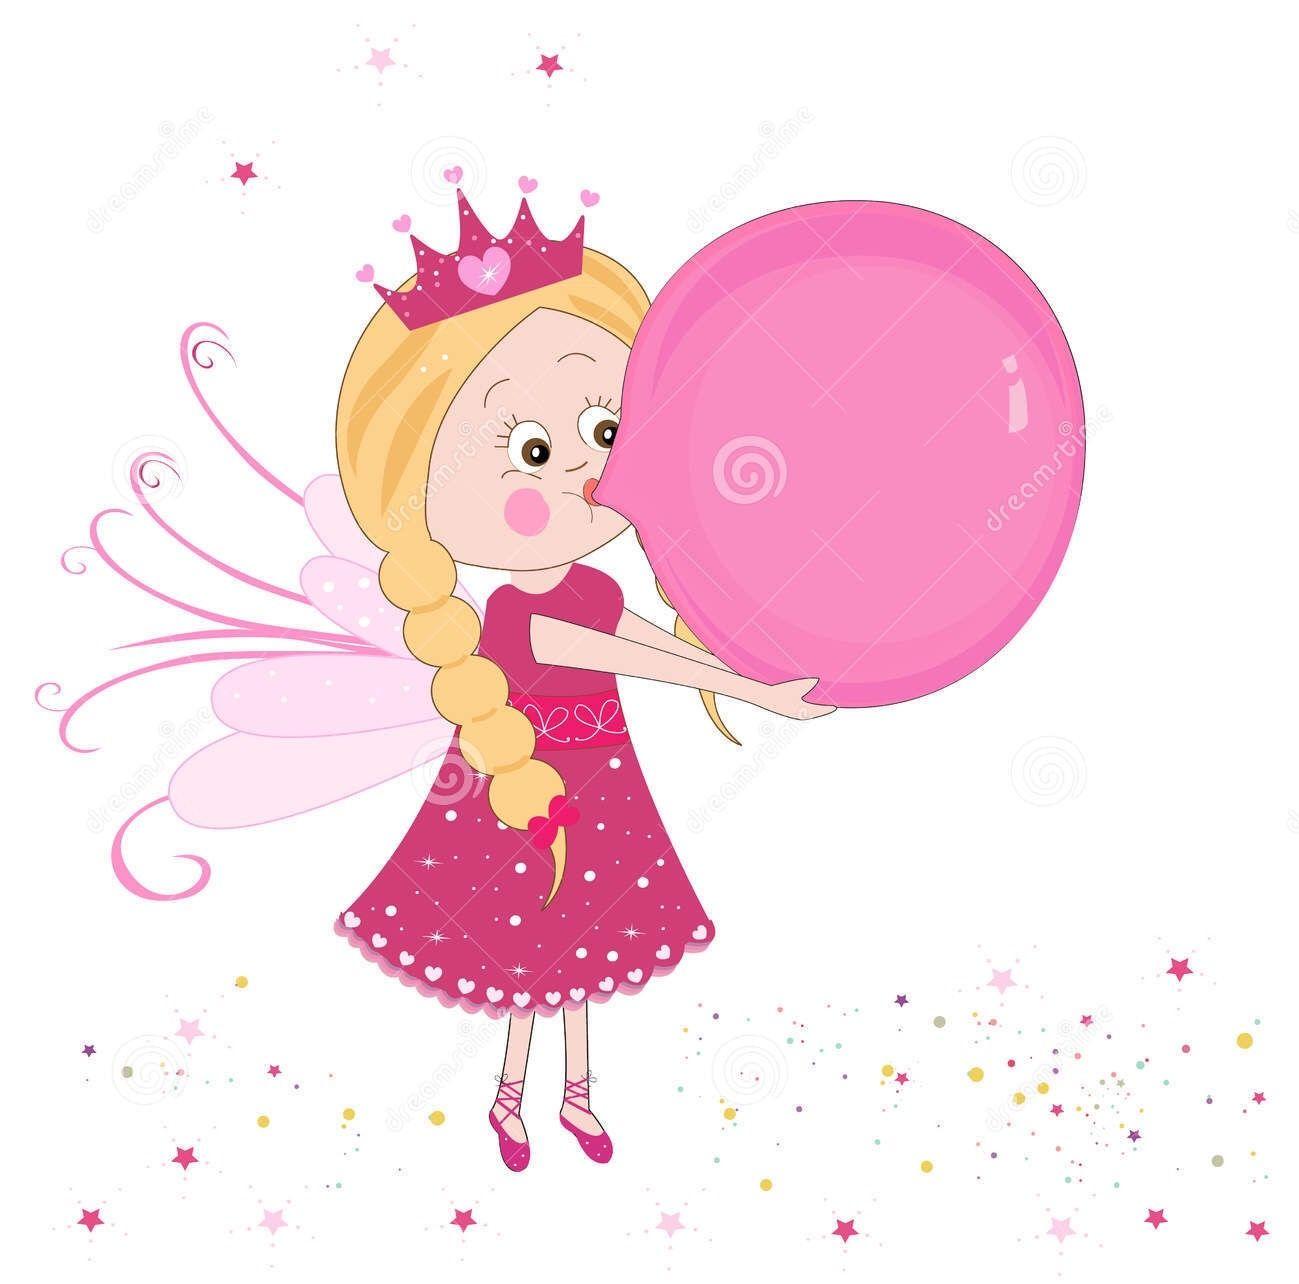 Fairy #dreamstime